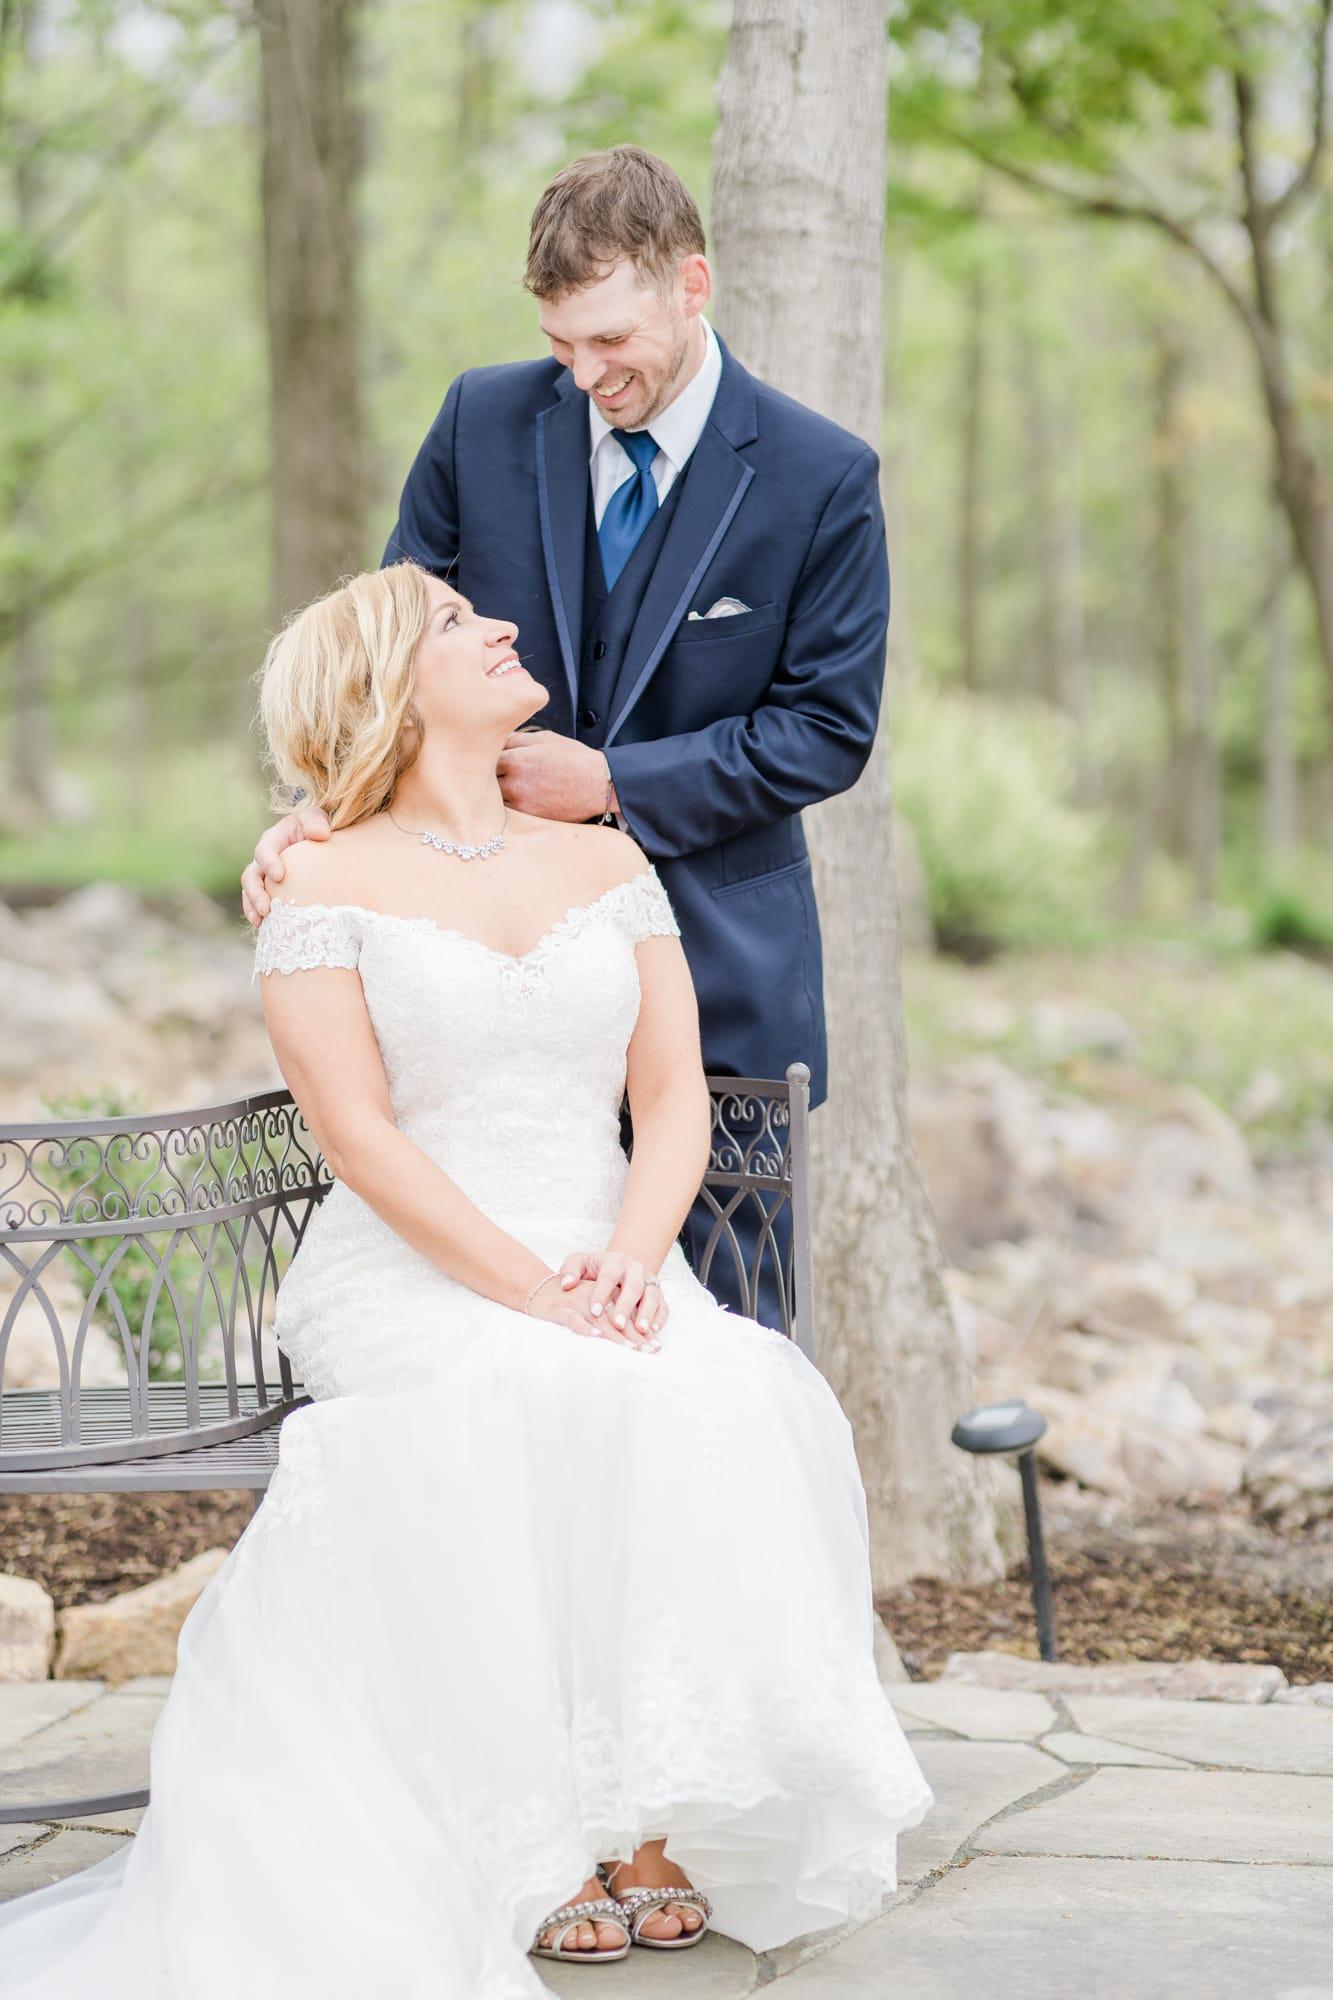 Bride and groom portrait at Rolling Rails Lodge wedding